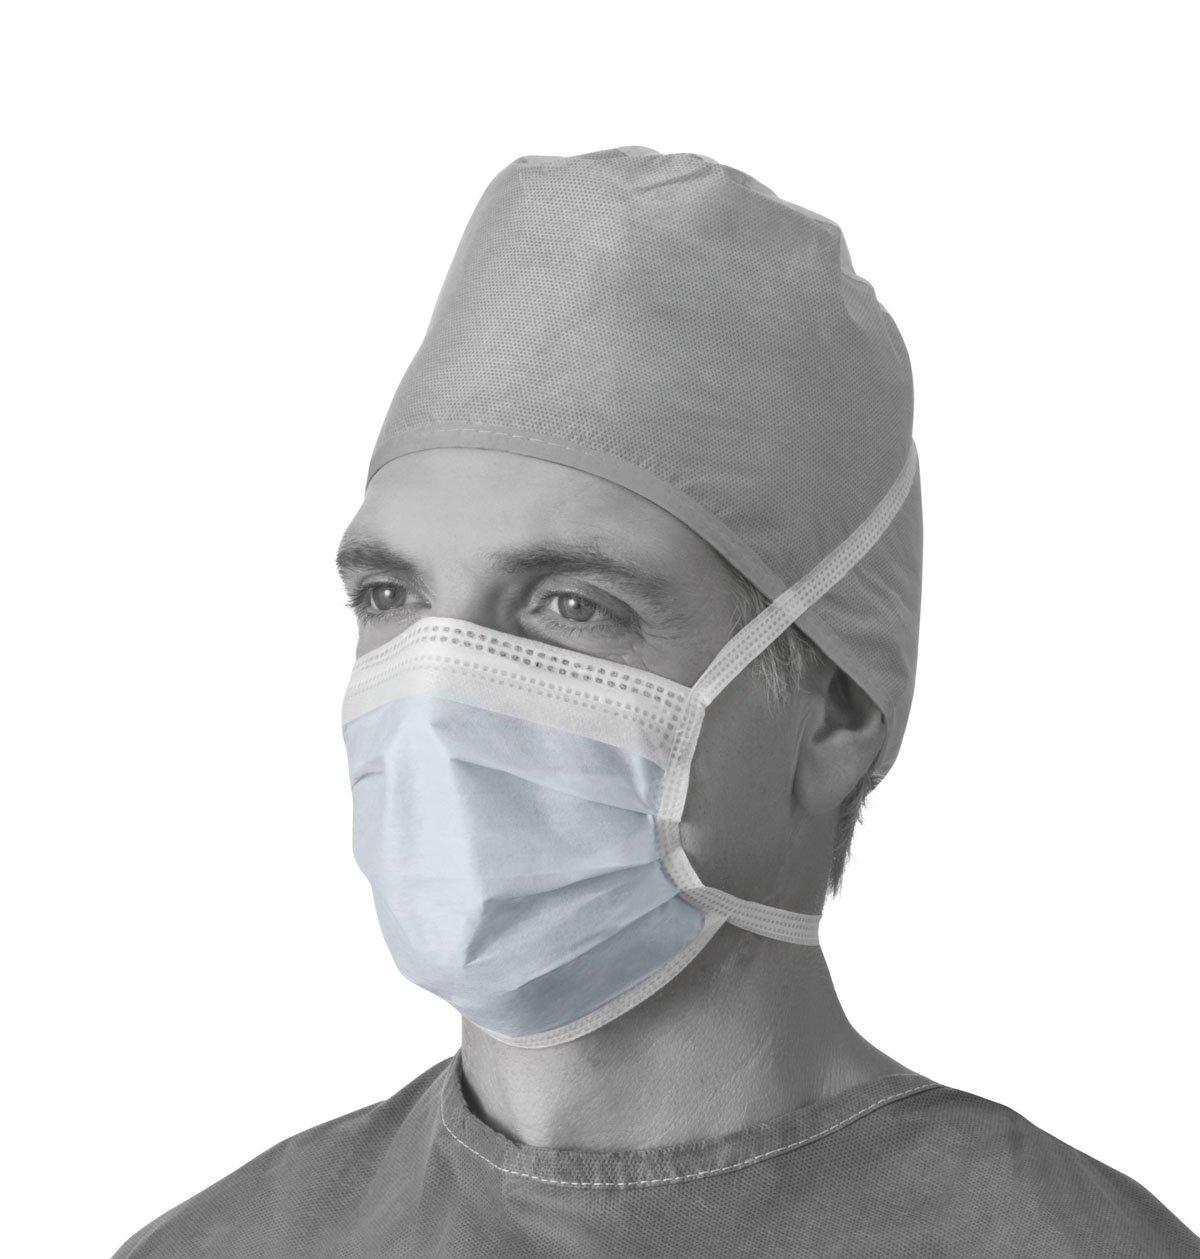 Medline NON27378AZ Anti-Fog Surgical Face Mask, Blue (Box of 50) by Medline (Image #1)